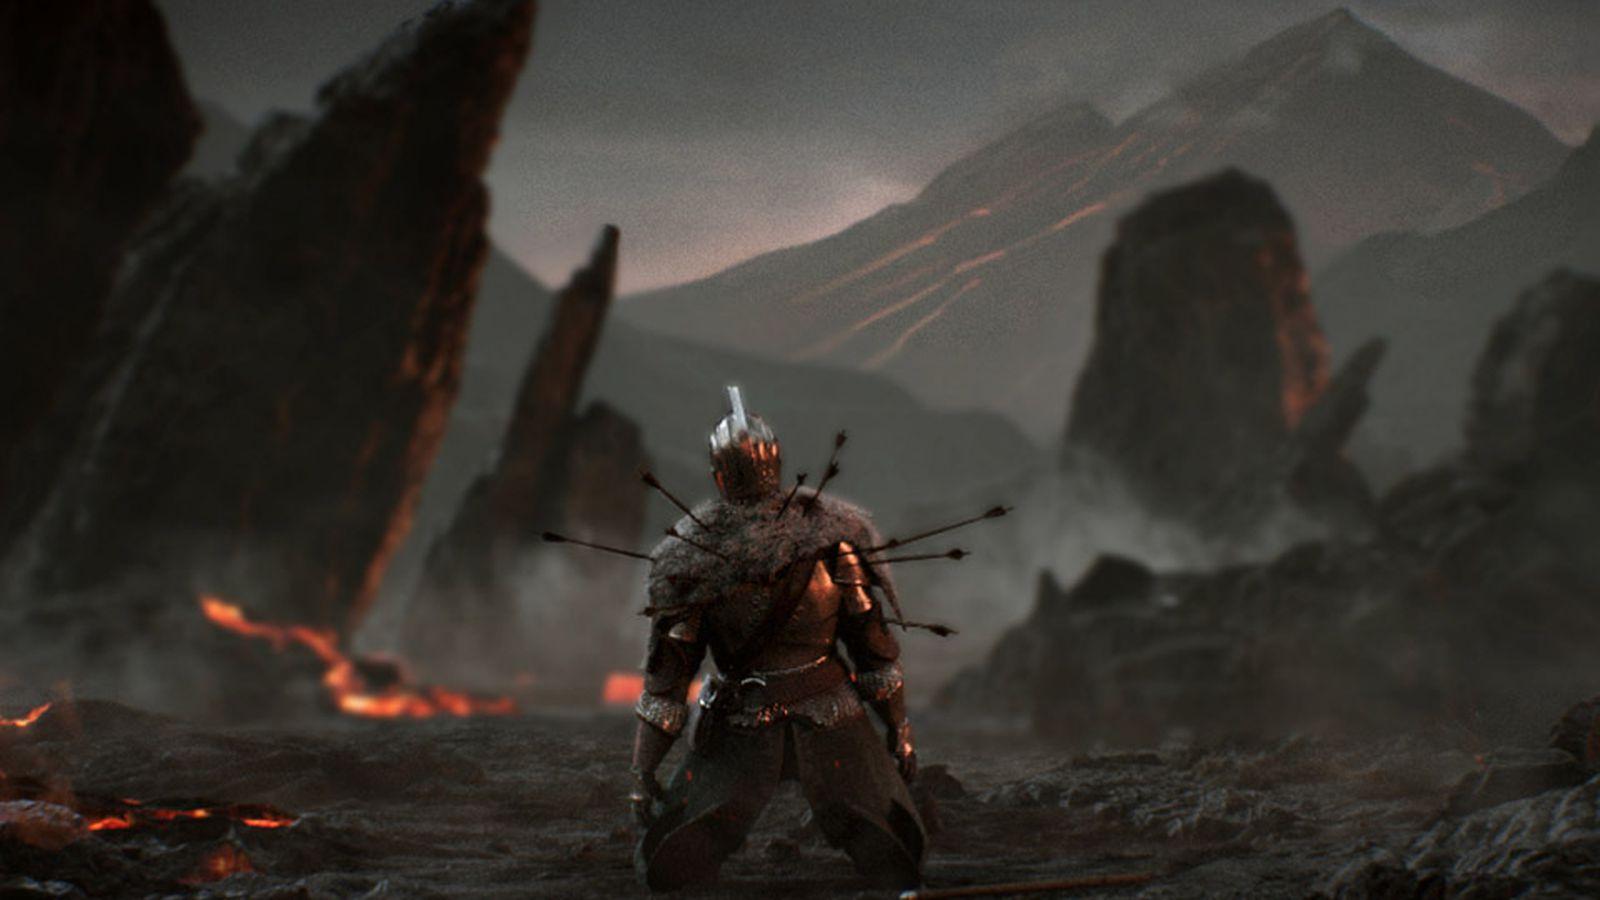 Dark Souls 3 Wallpaper Quote Dark Souls 2 Developer If Dark Souls Was Set In The North